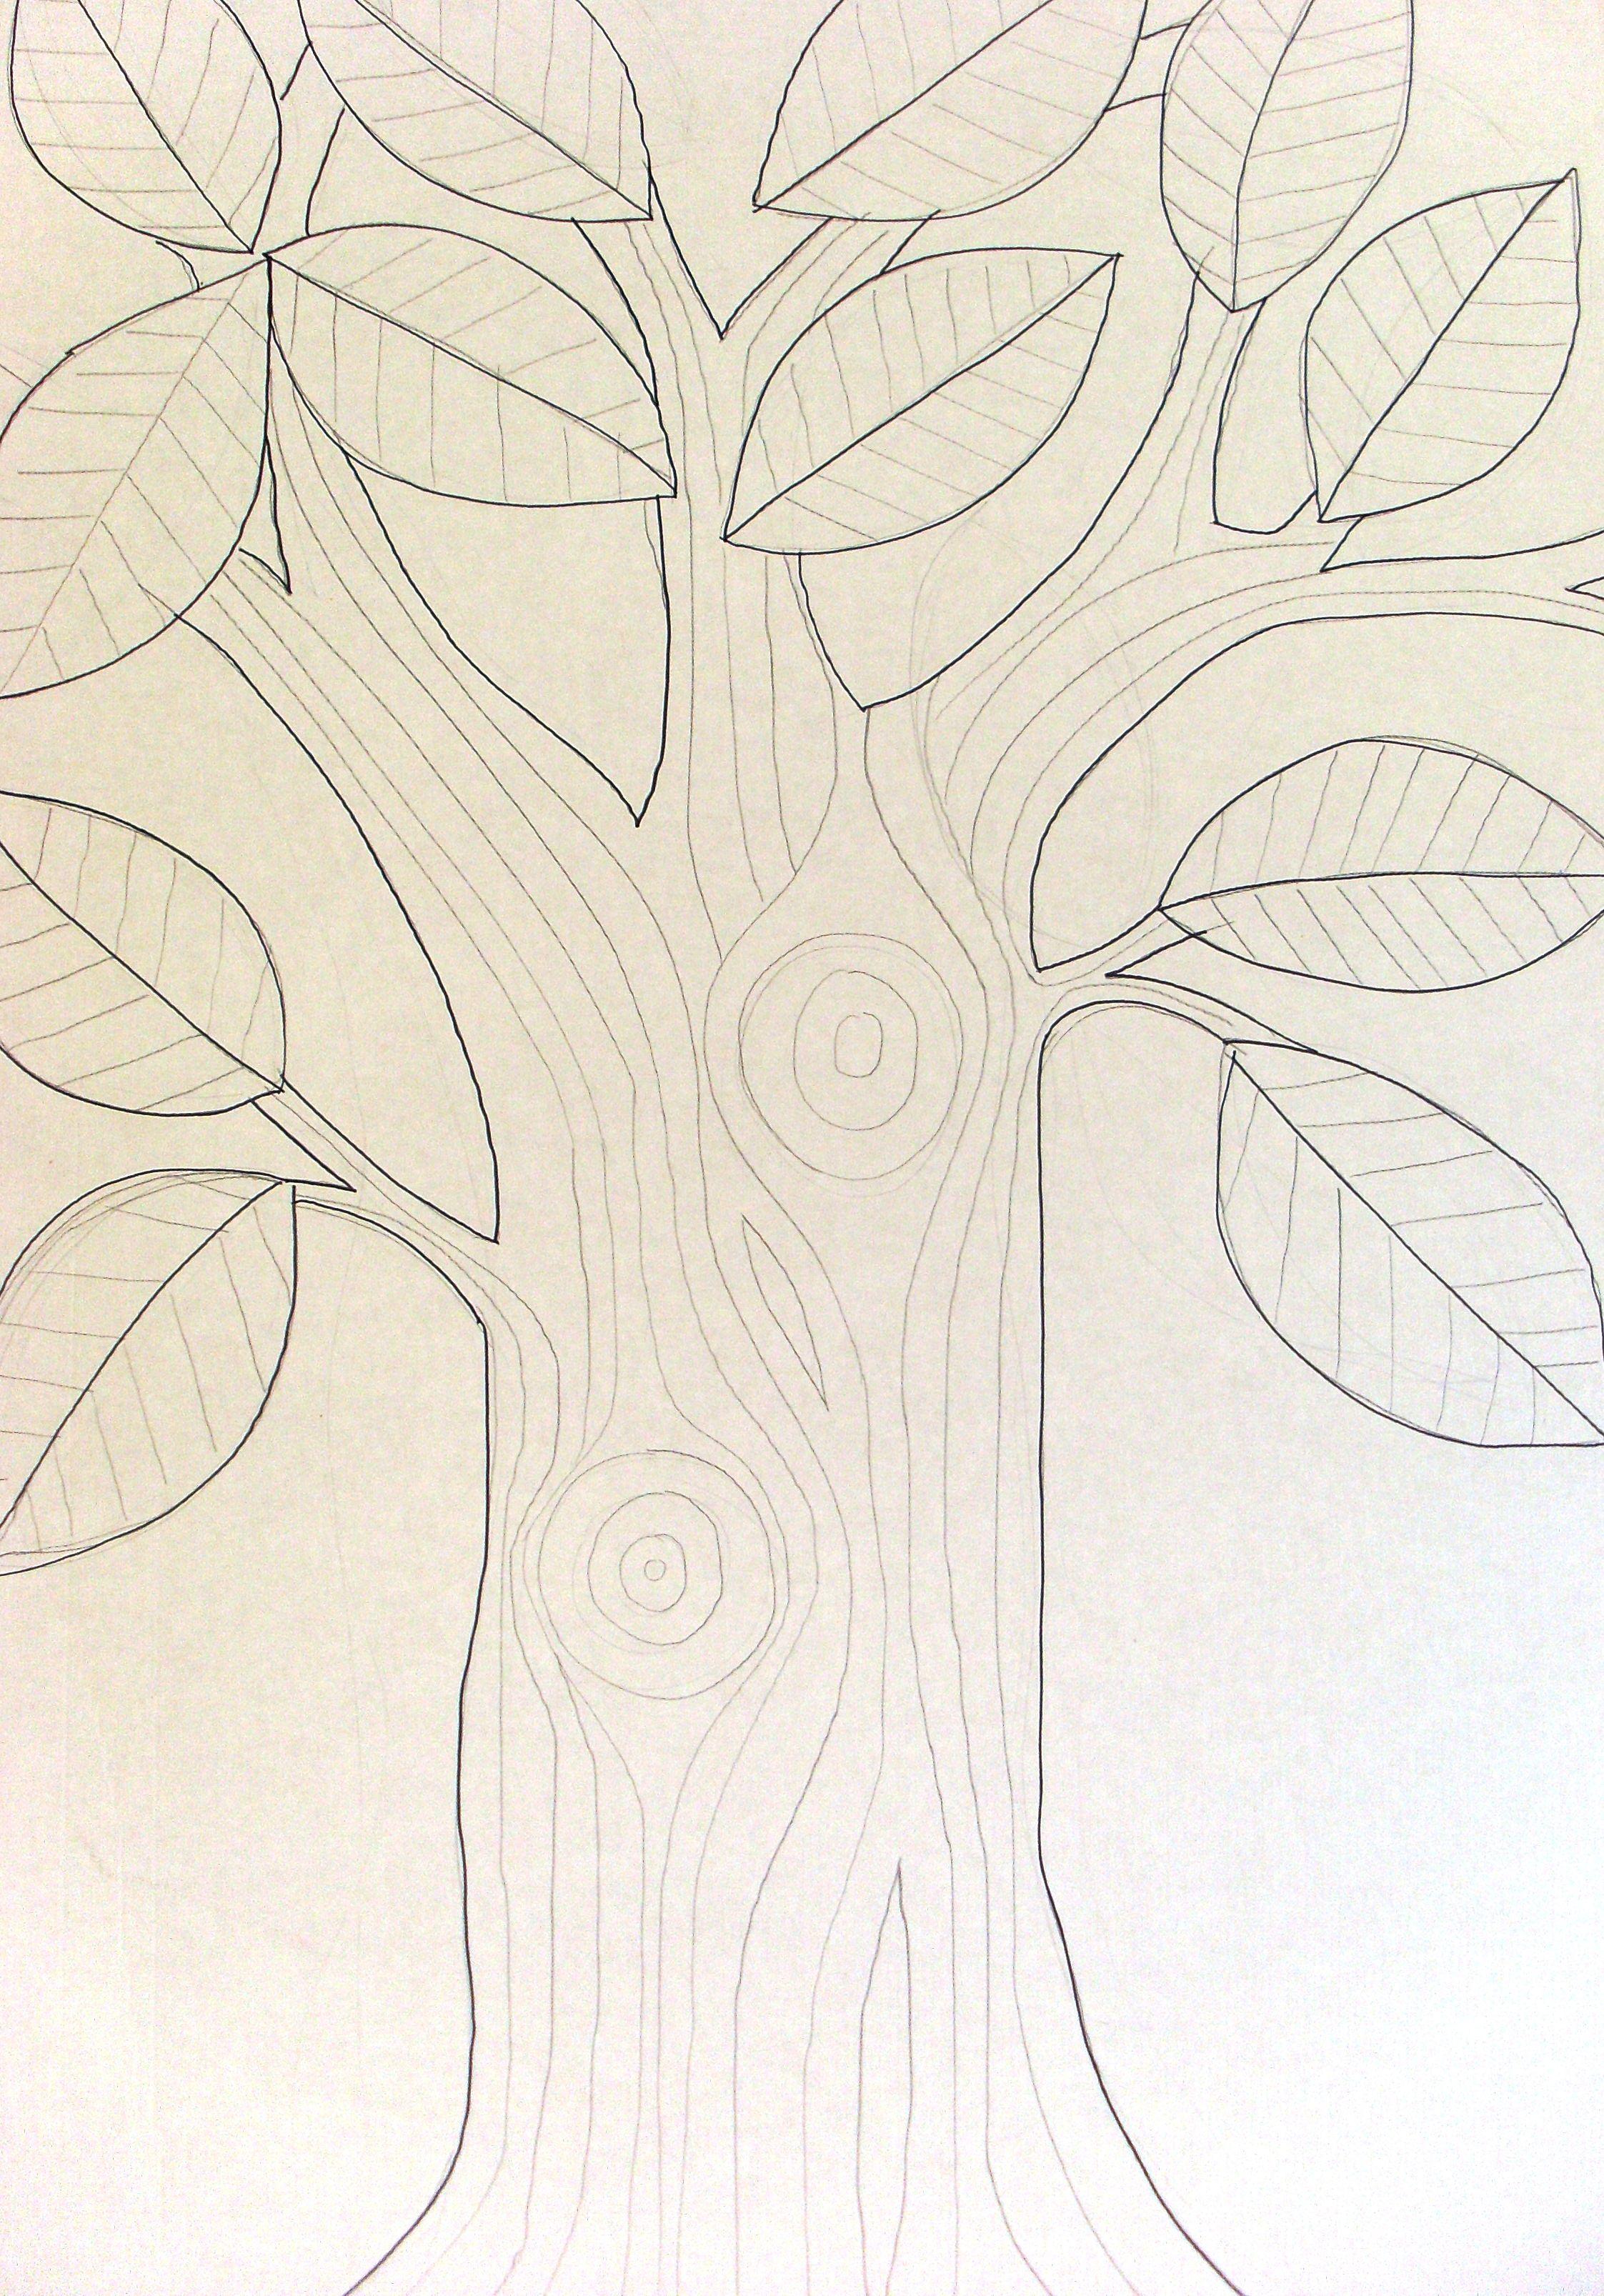 Drawing for wishing tree by Zoe Mafham www.zoemafham.wix ...